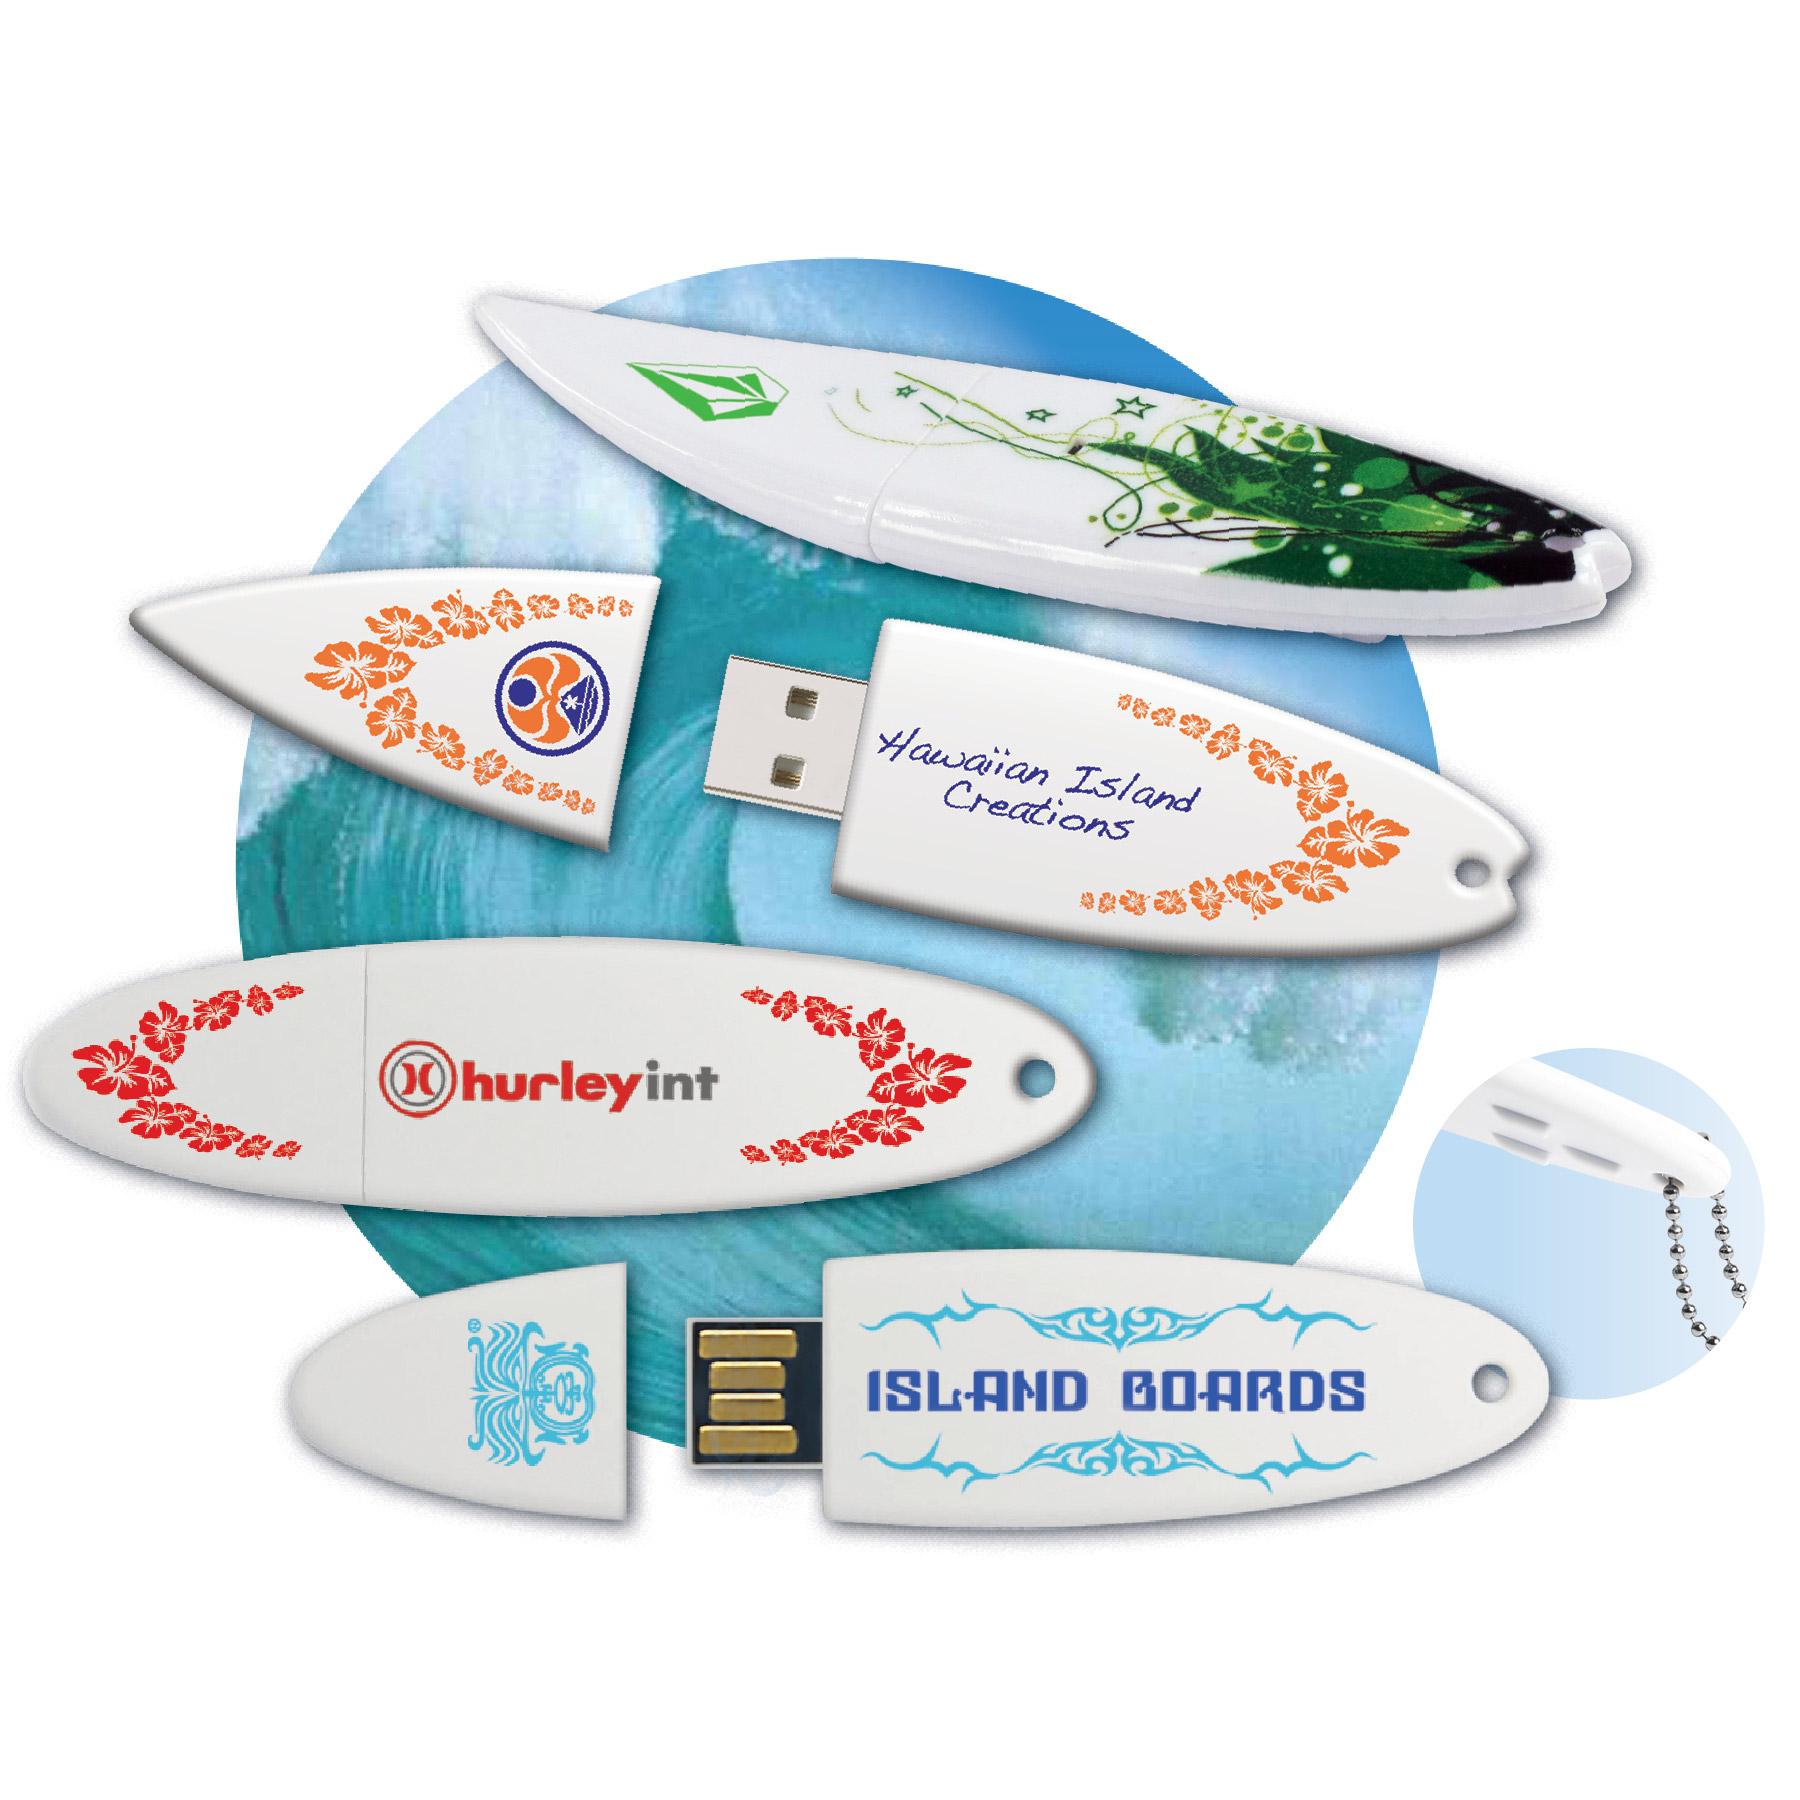 KCAIO-USBSR-1GB